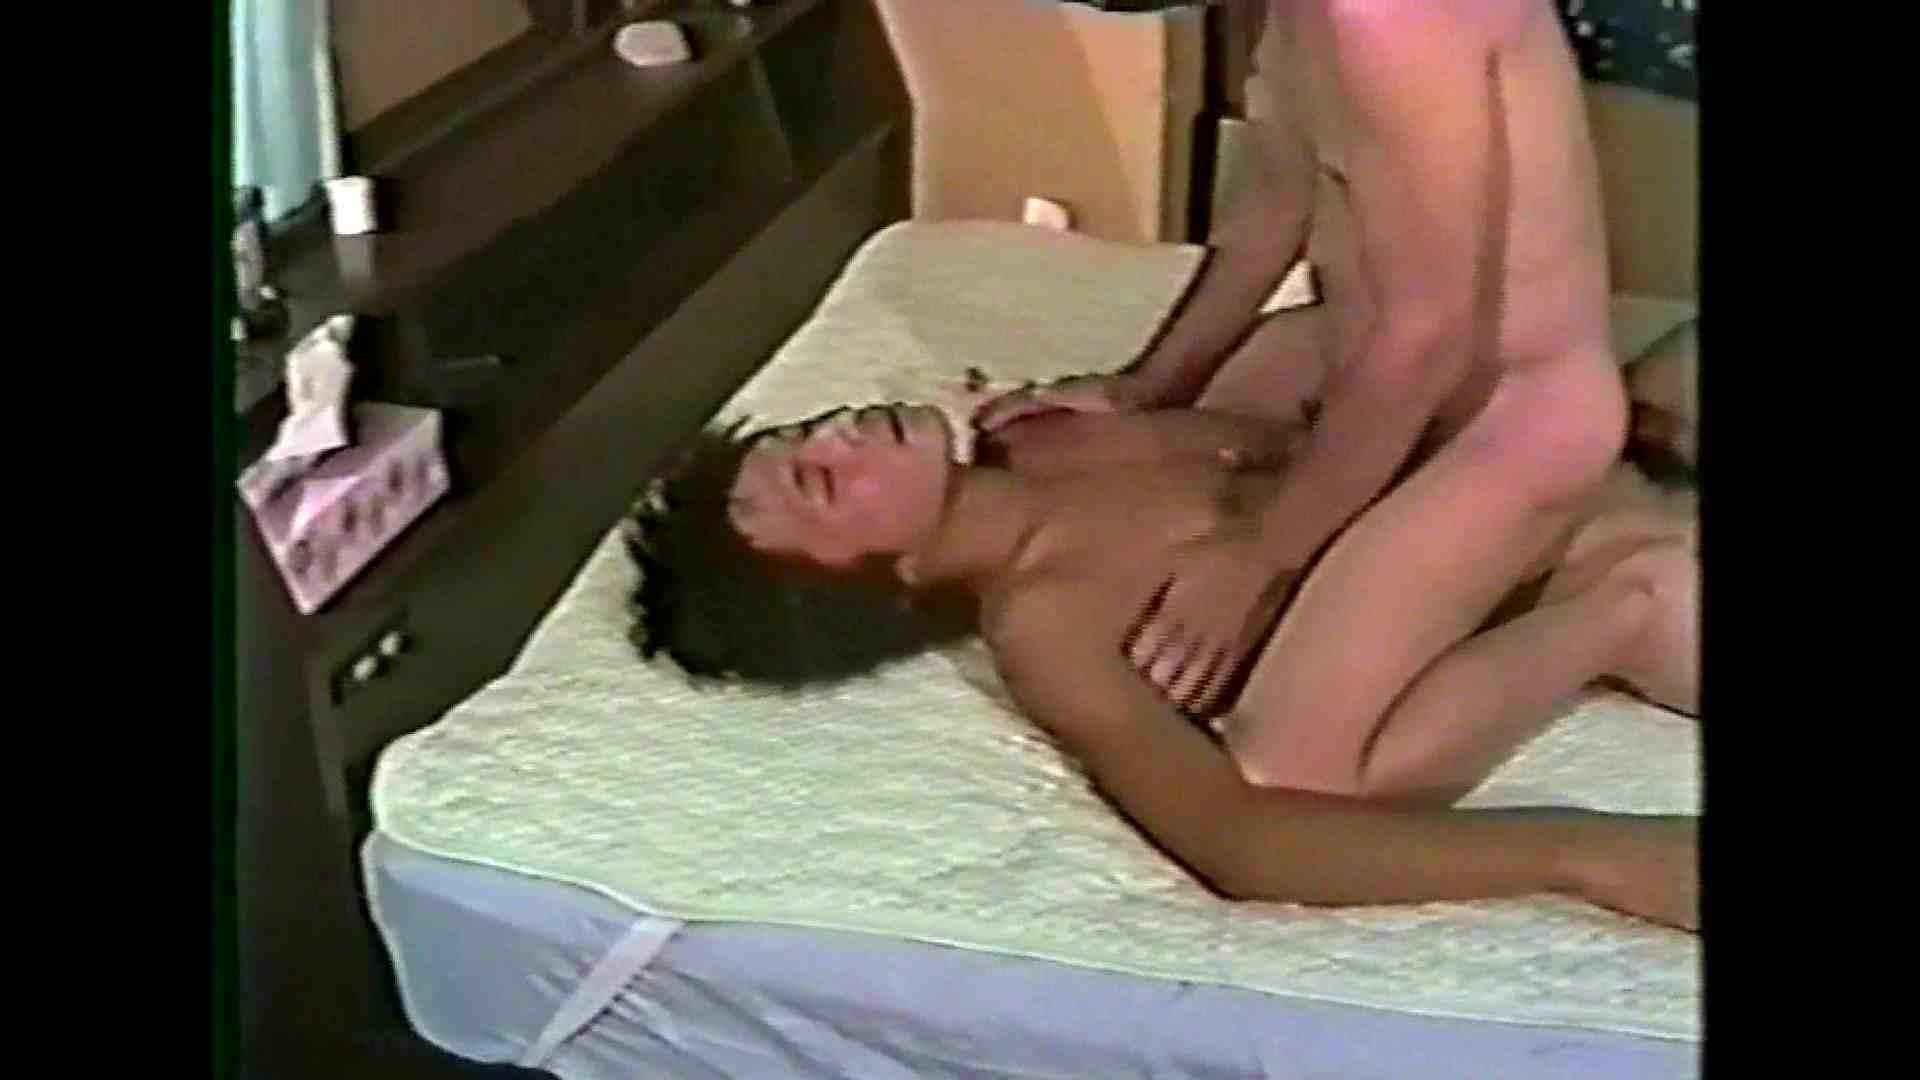 GAYBOY宏のオカズ倉庫Vol.3-2 ノンケ  95pic 20